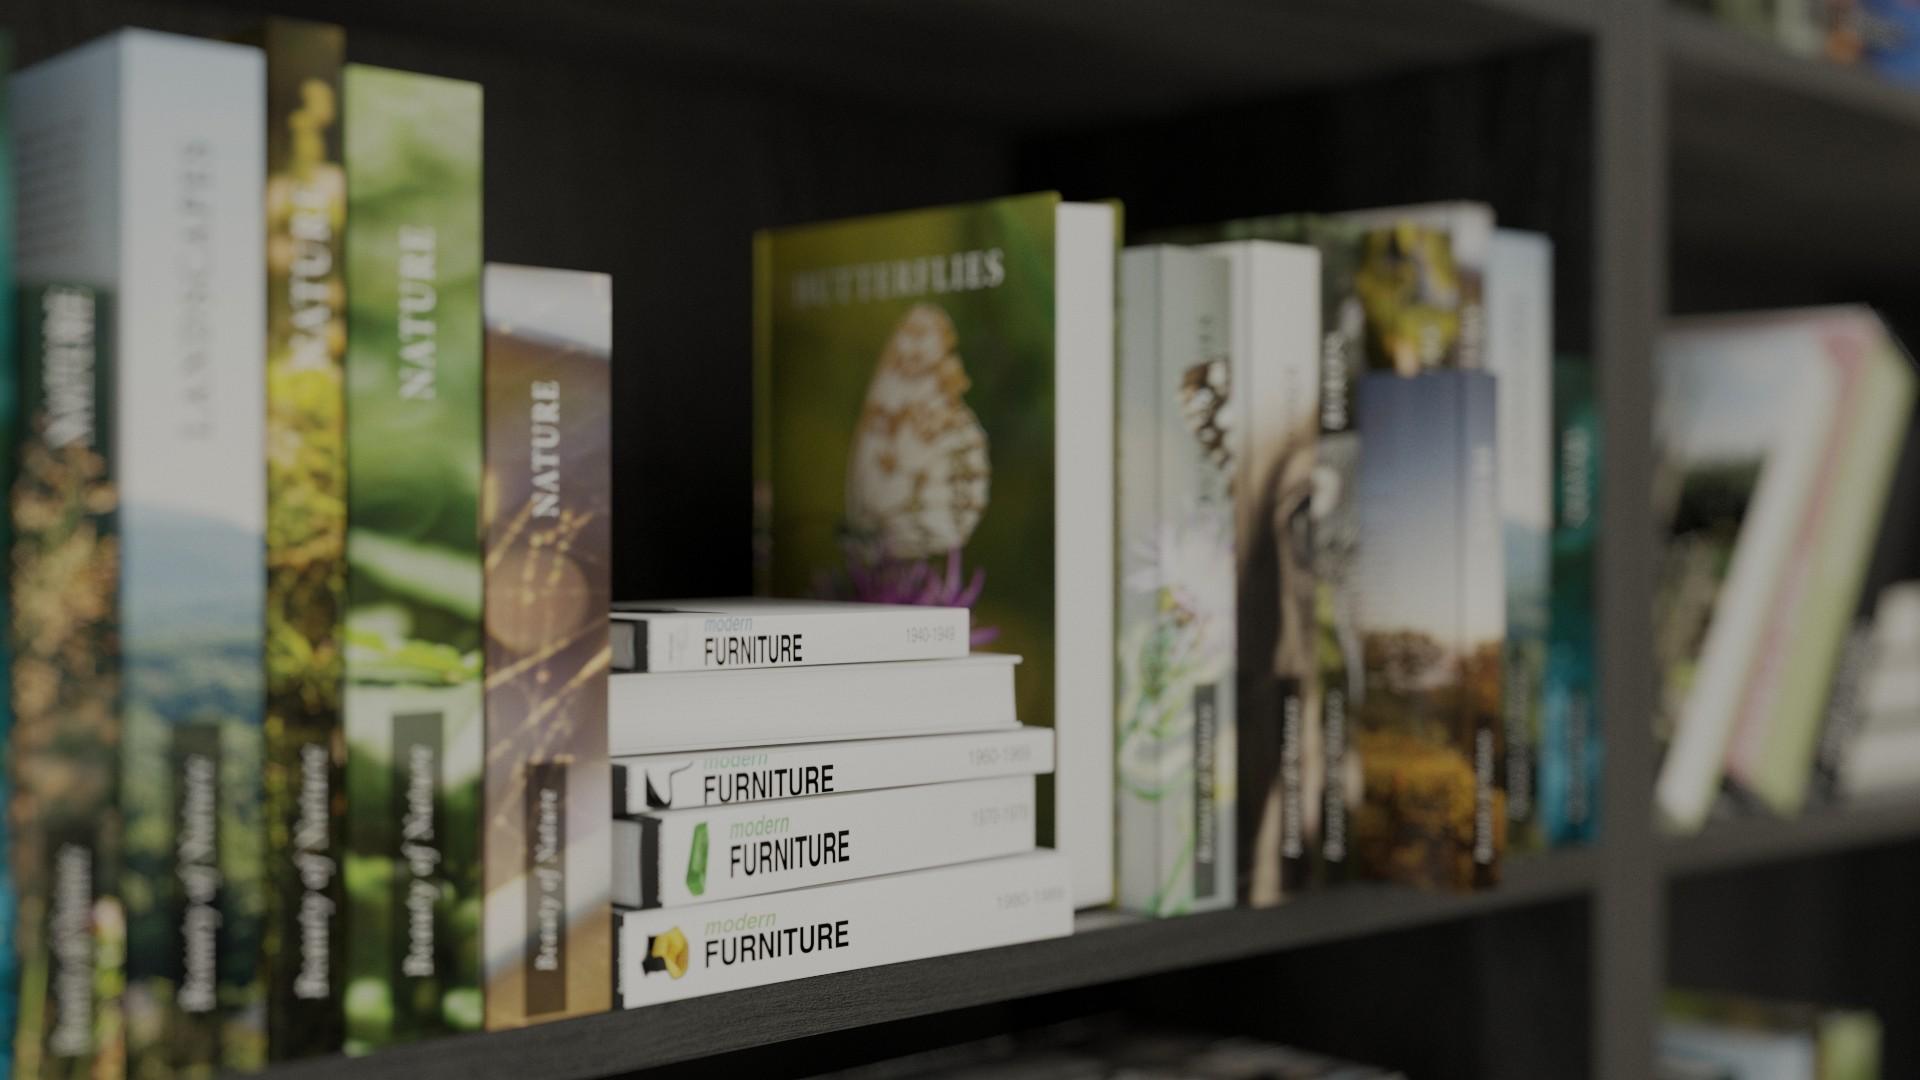 90 various book models